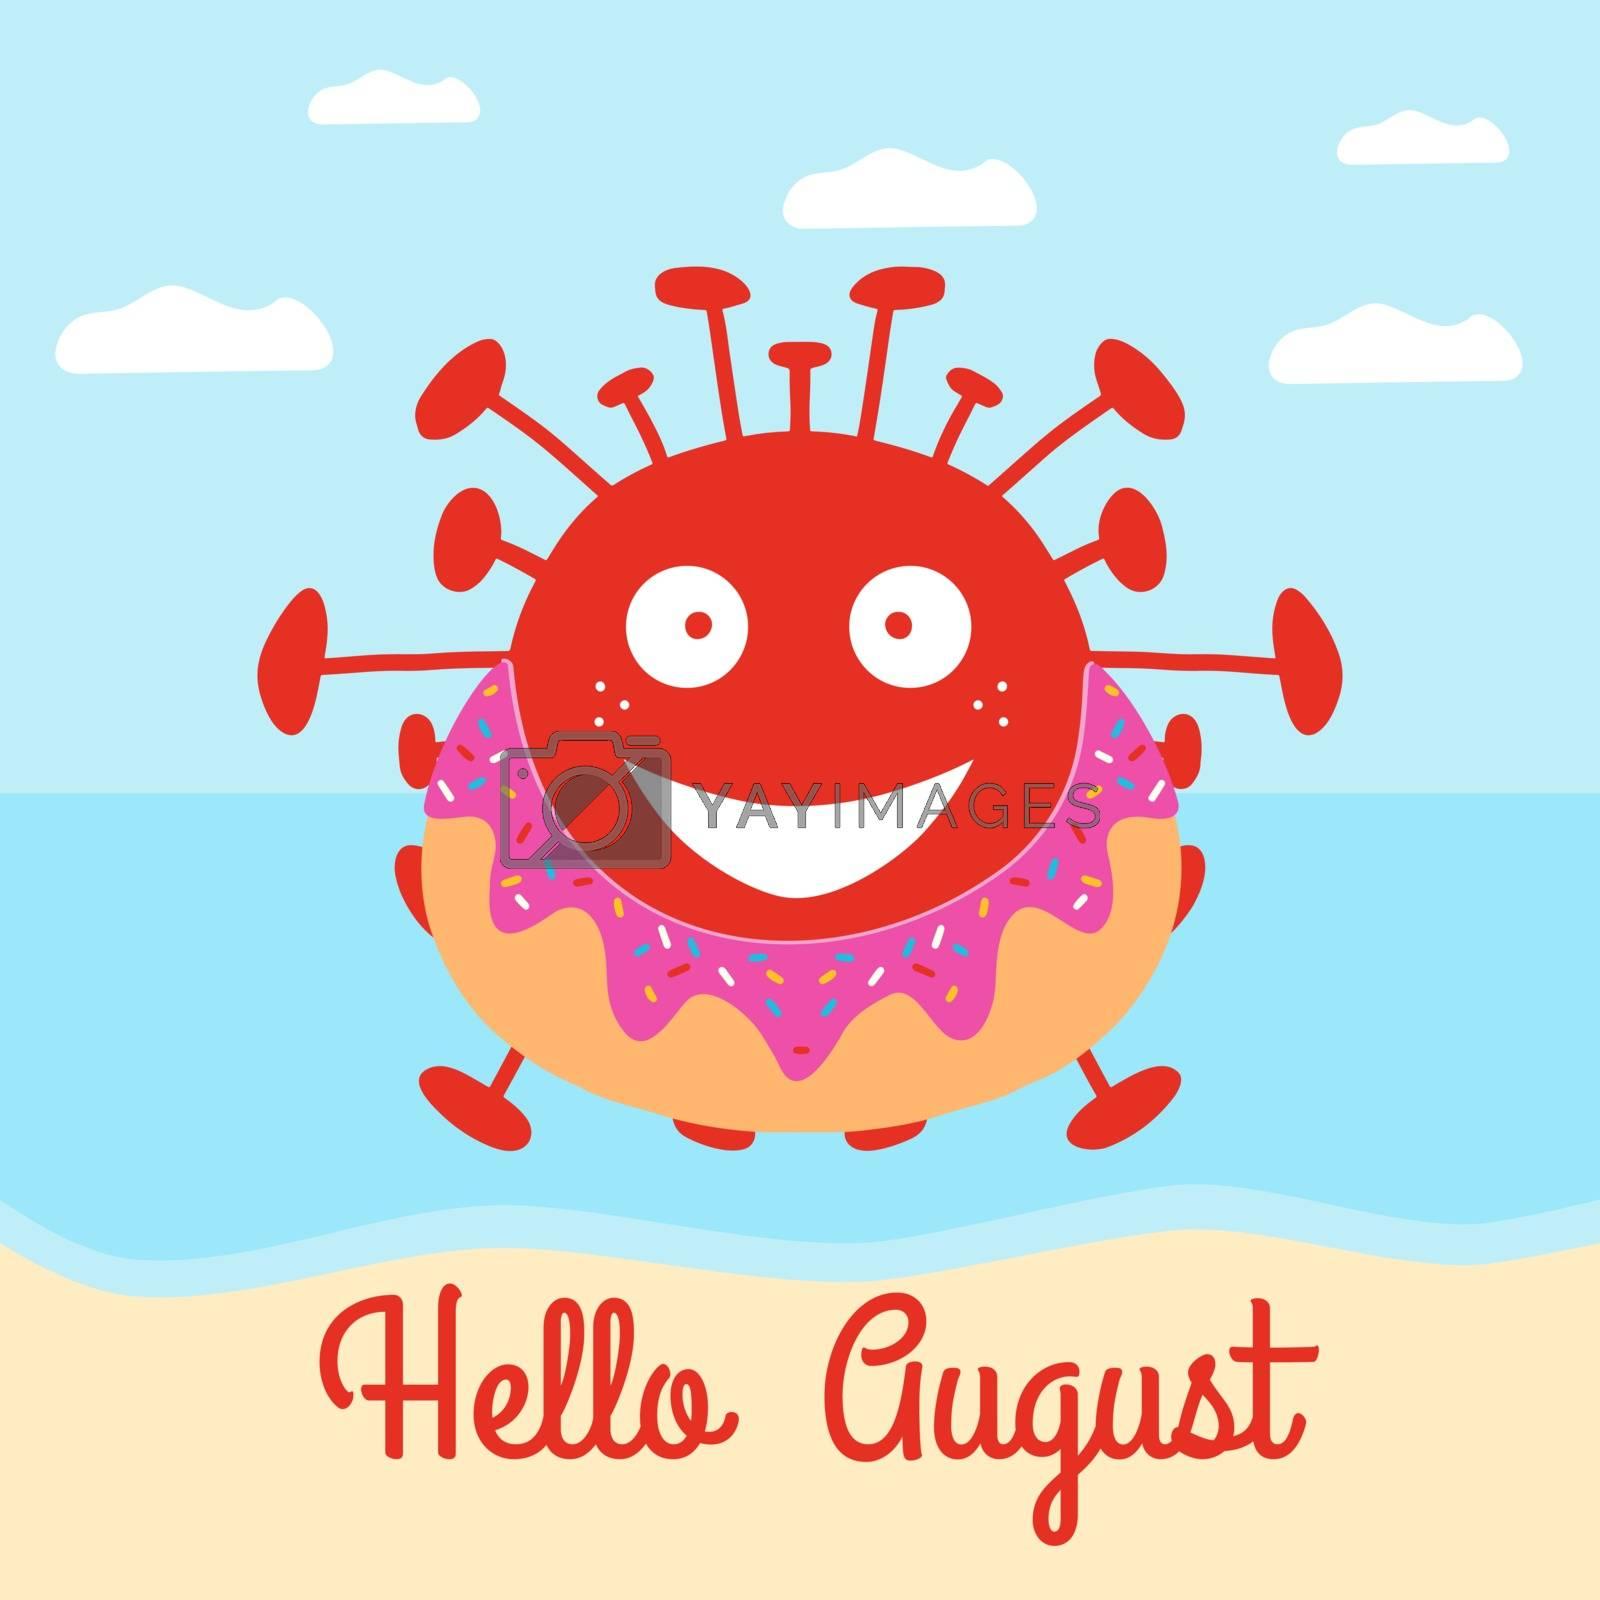 Hello August. Red cartoon coronavirus bacteria in donut swimming circle on a beach. Vector stock illustration.